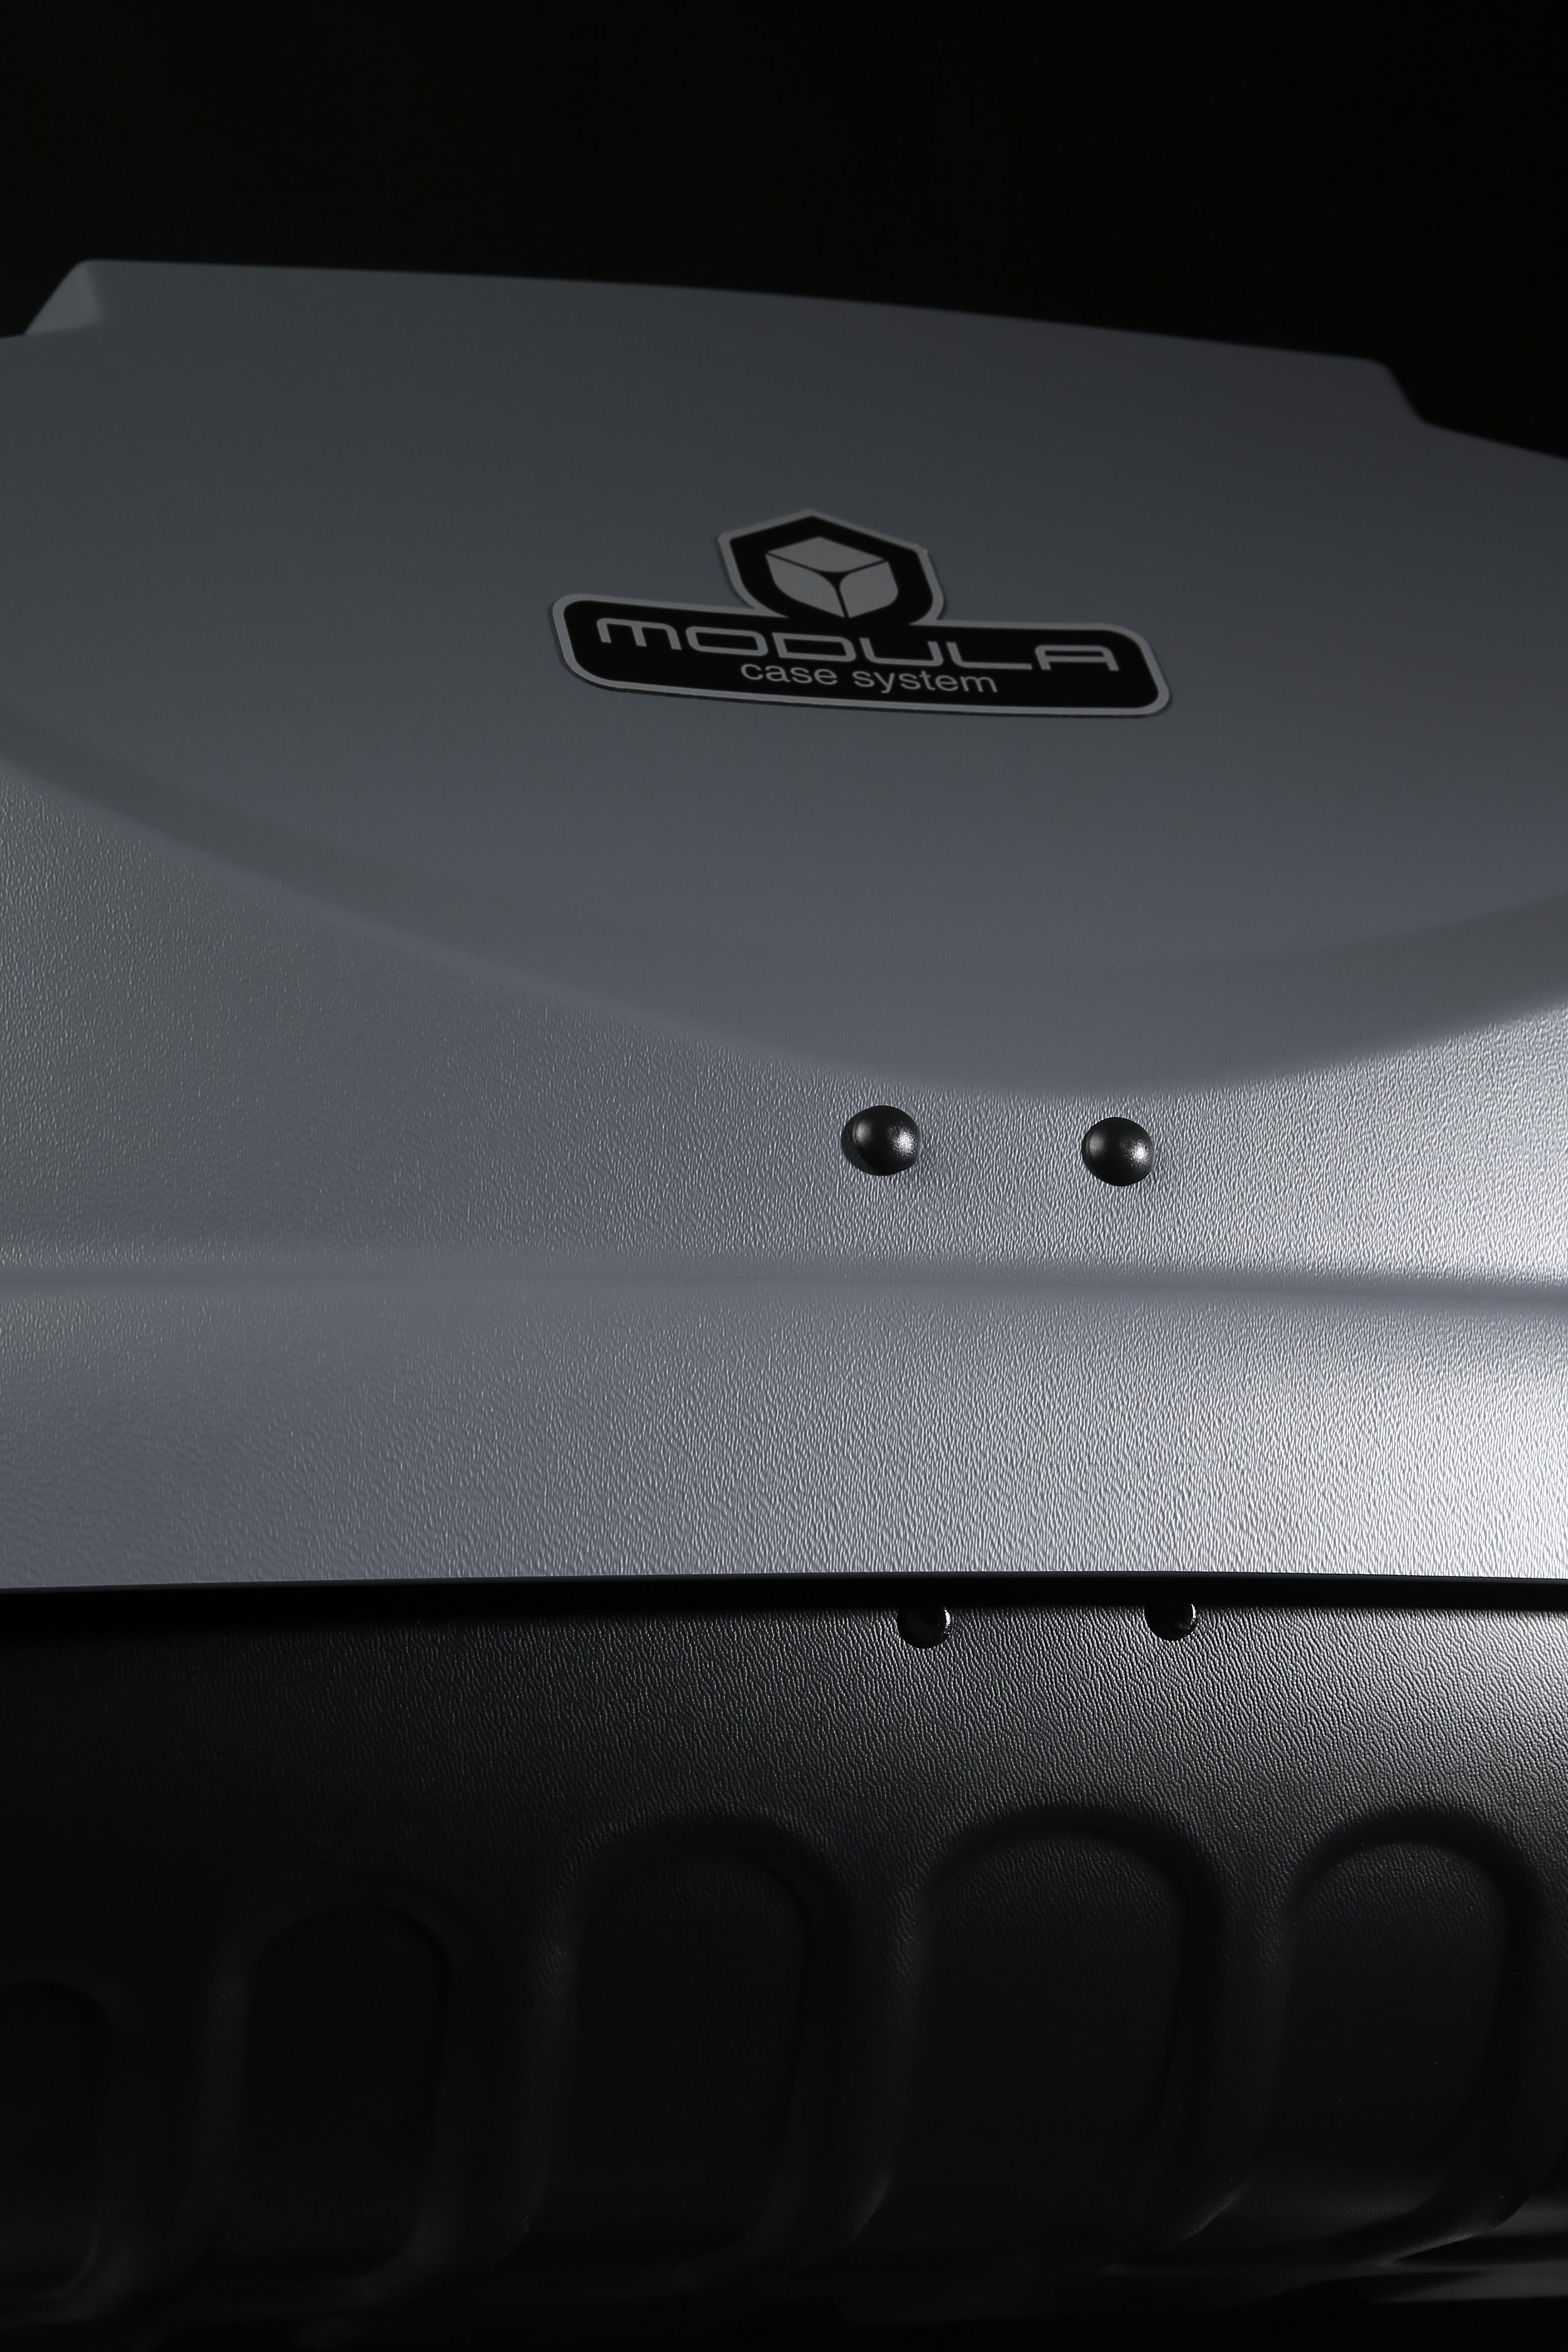 MOCS0329 MODULA γνήσιας ποιότητας